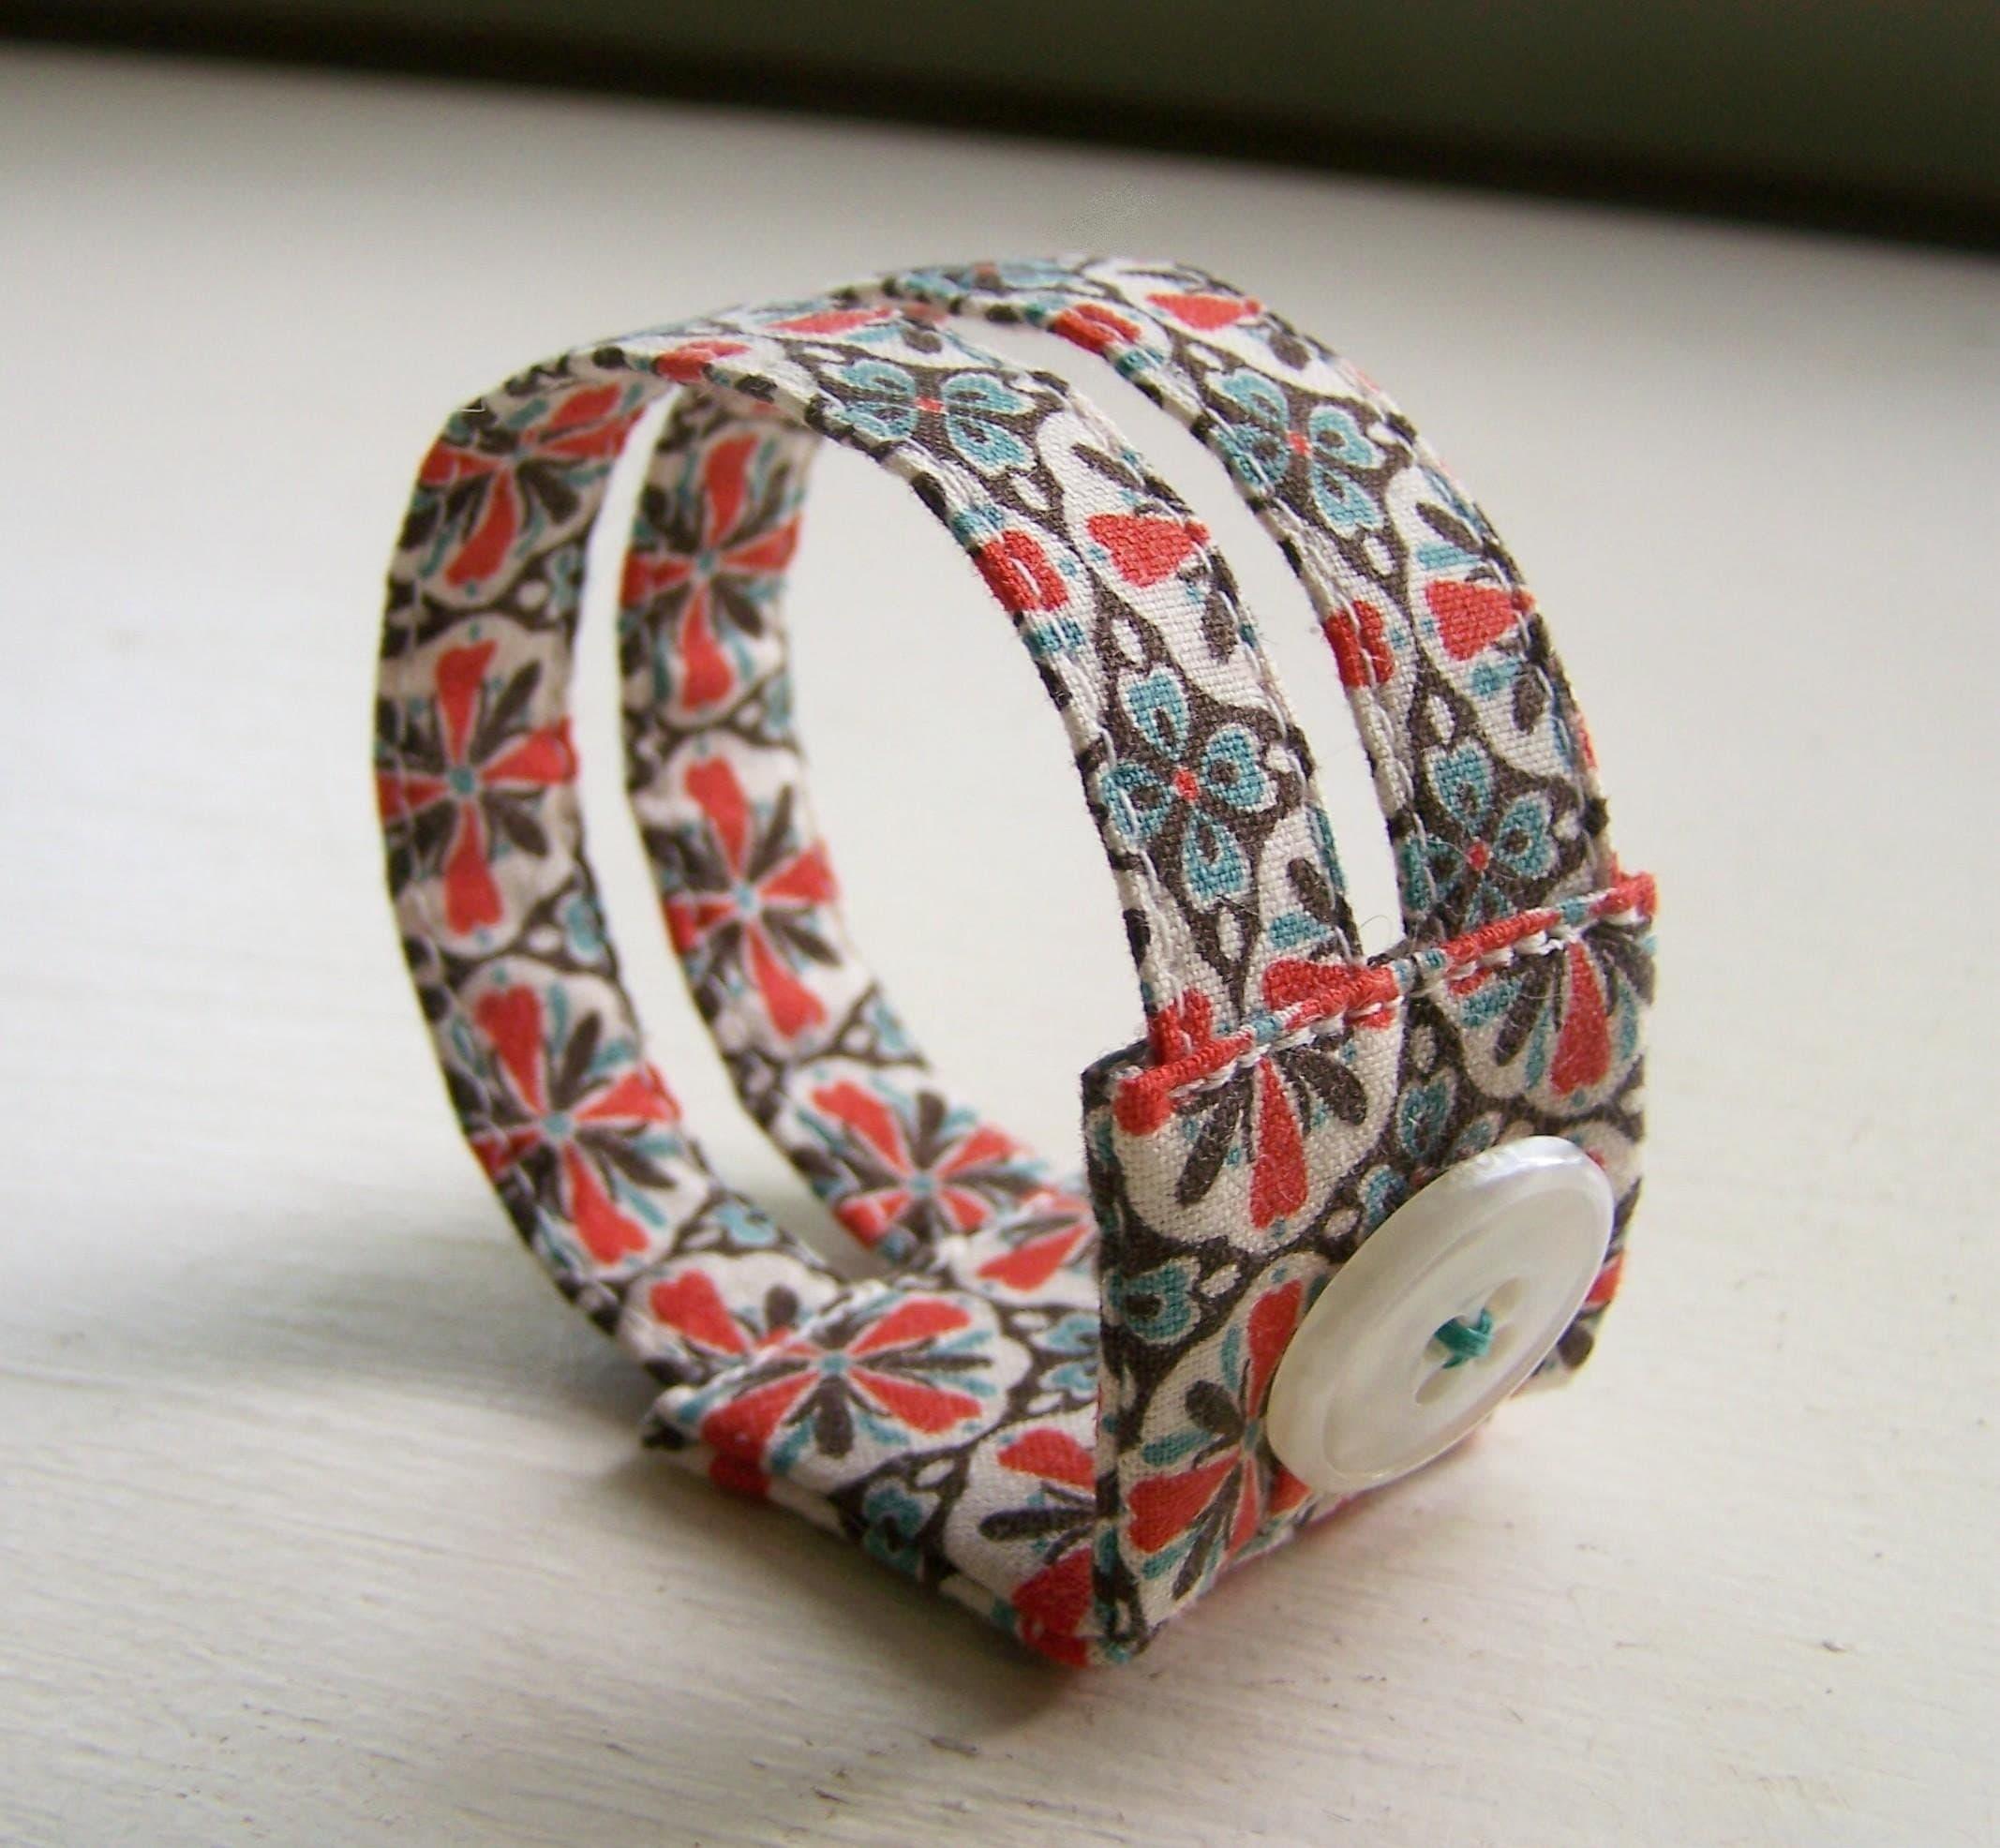 Double strand cuff bracelet in retro red and aqua